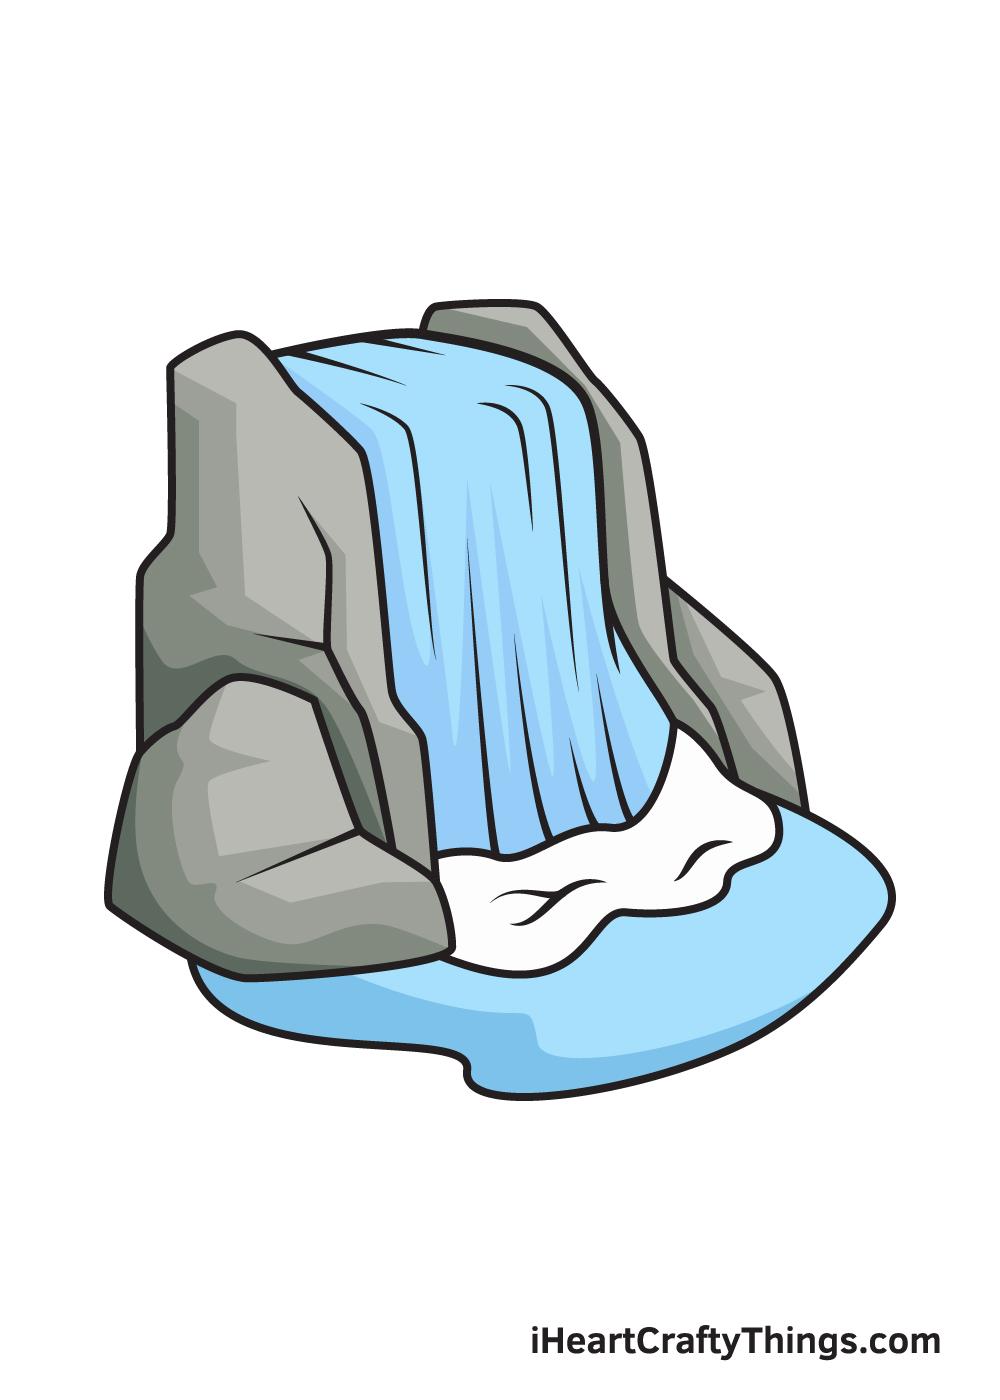 waterfall drawing 9 steps